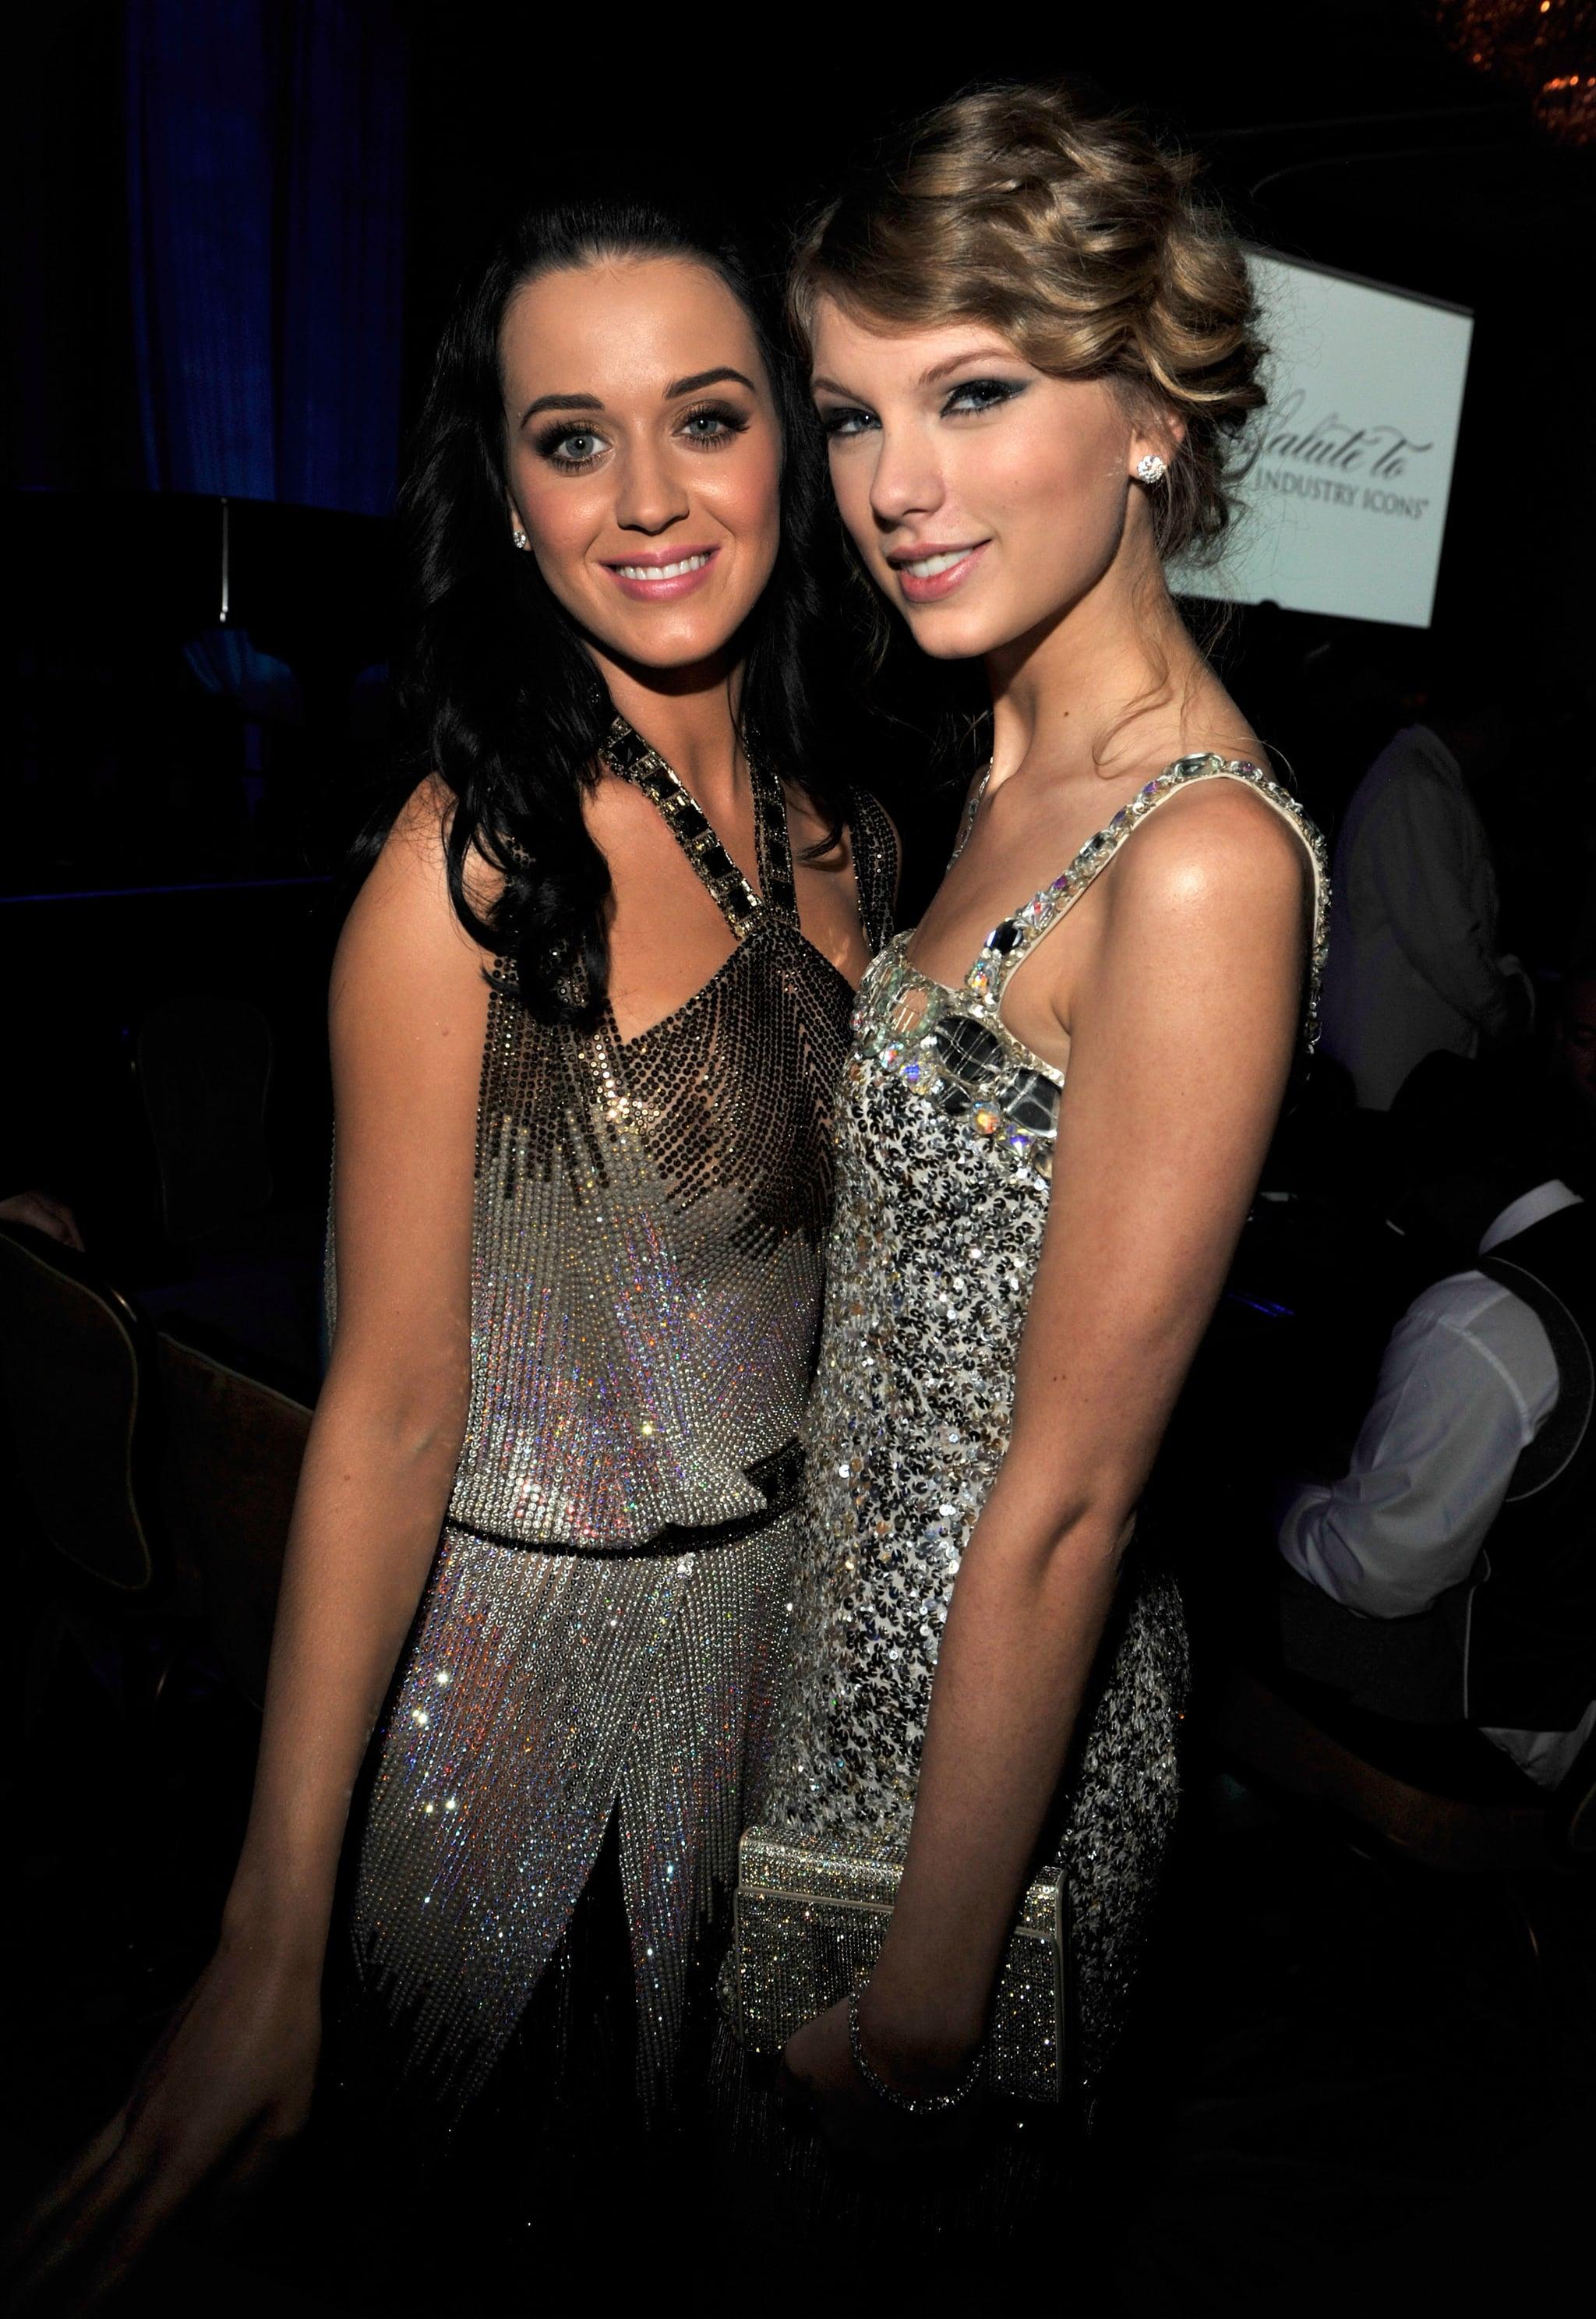 Kuka dating Katy Perry 2014